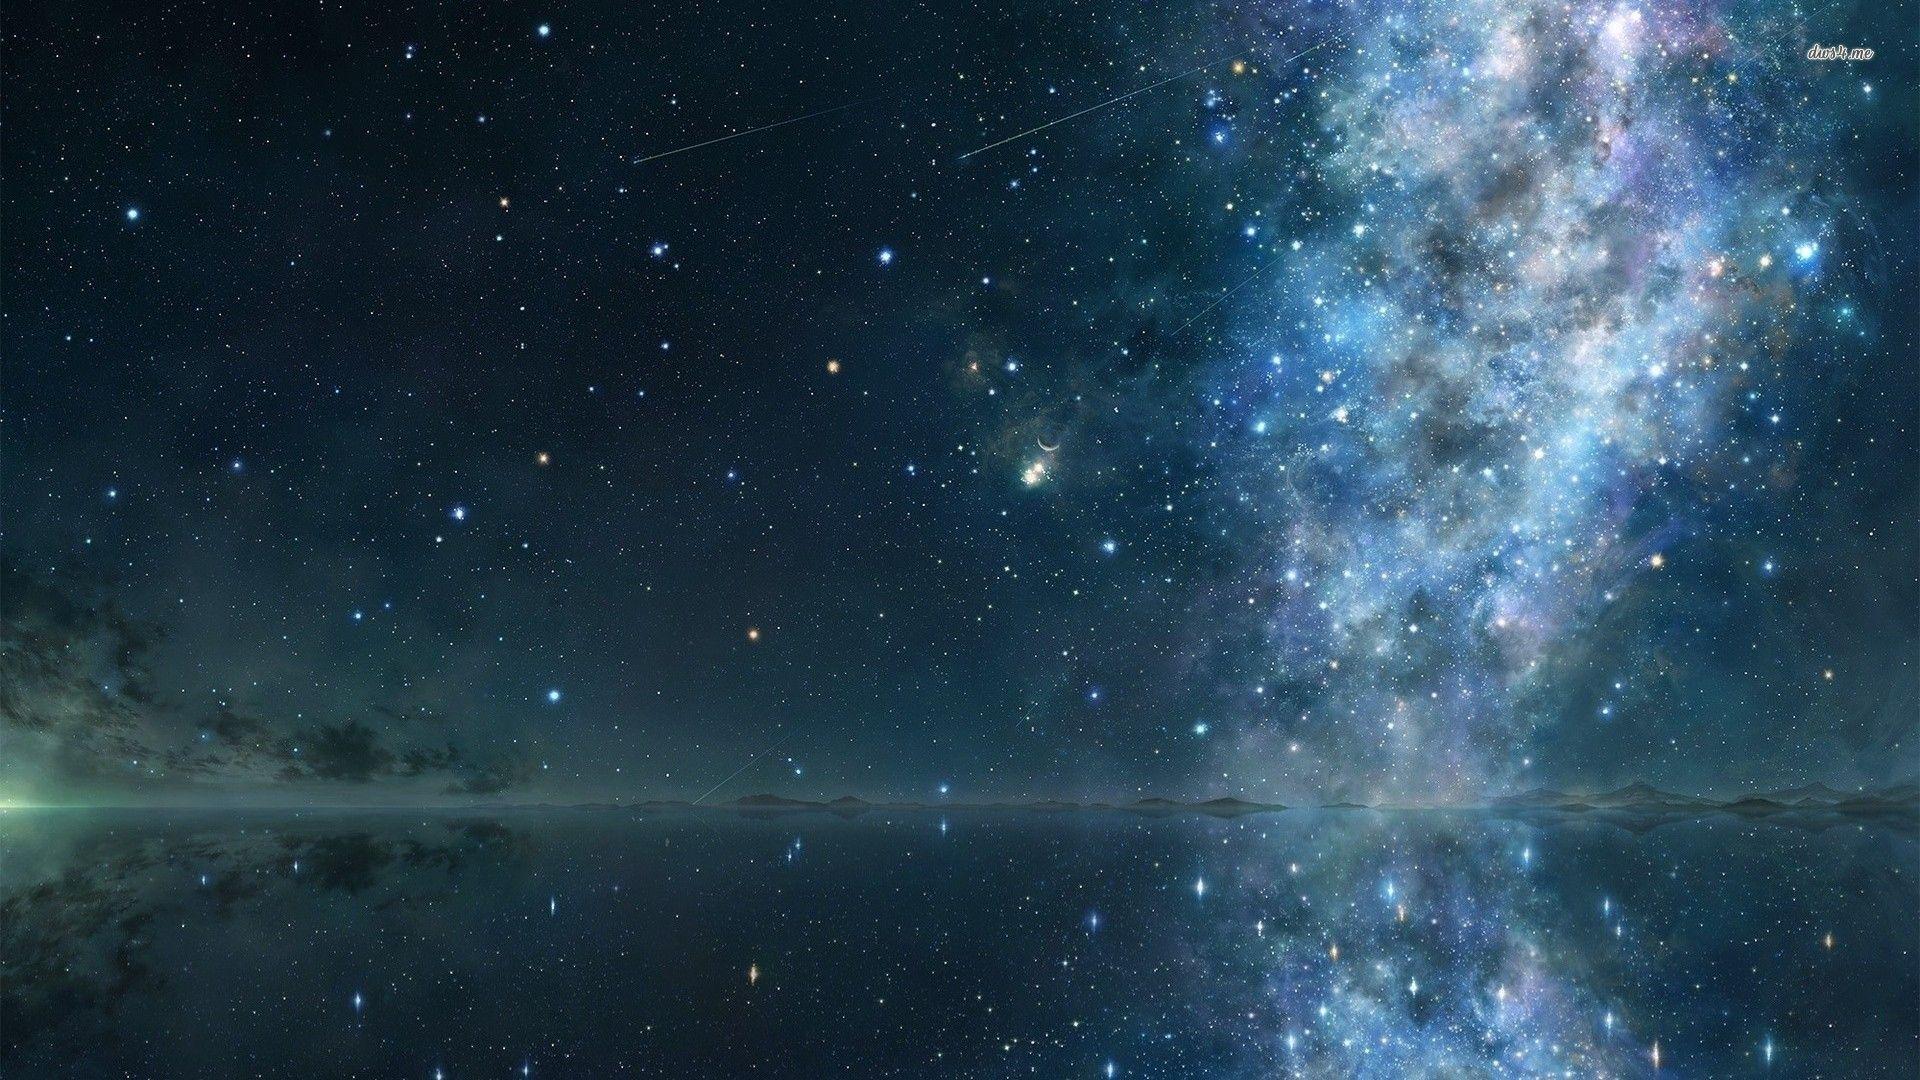 Lake Reflecting The Starry Sky Wallpaper Free Night Sky